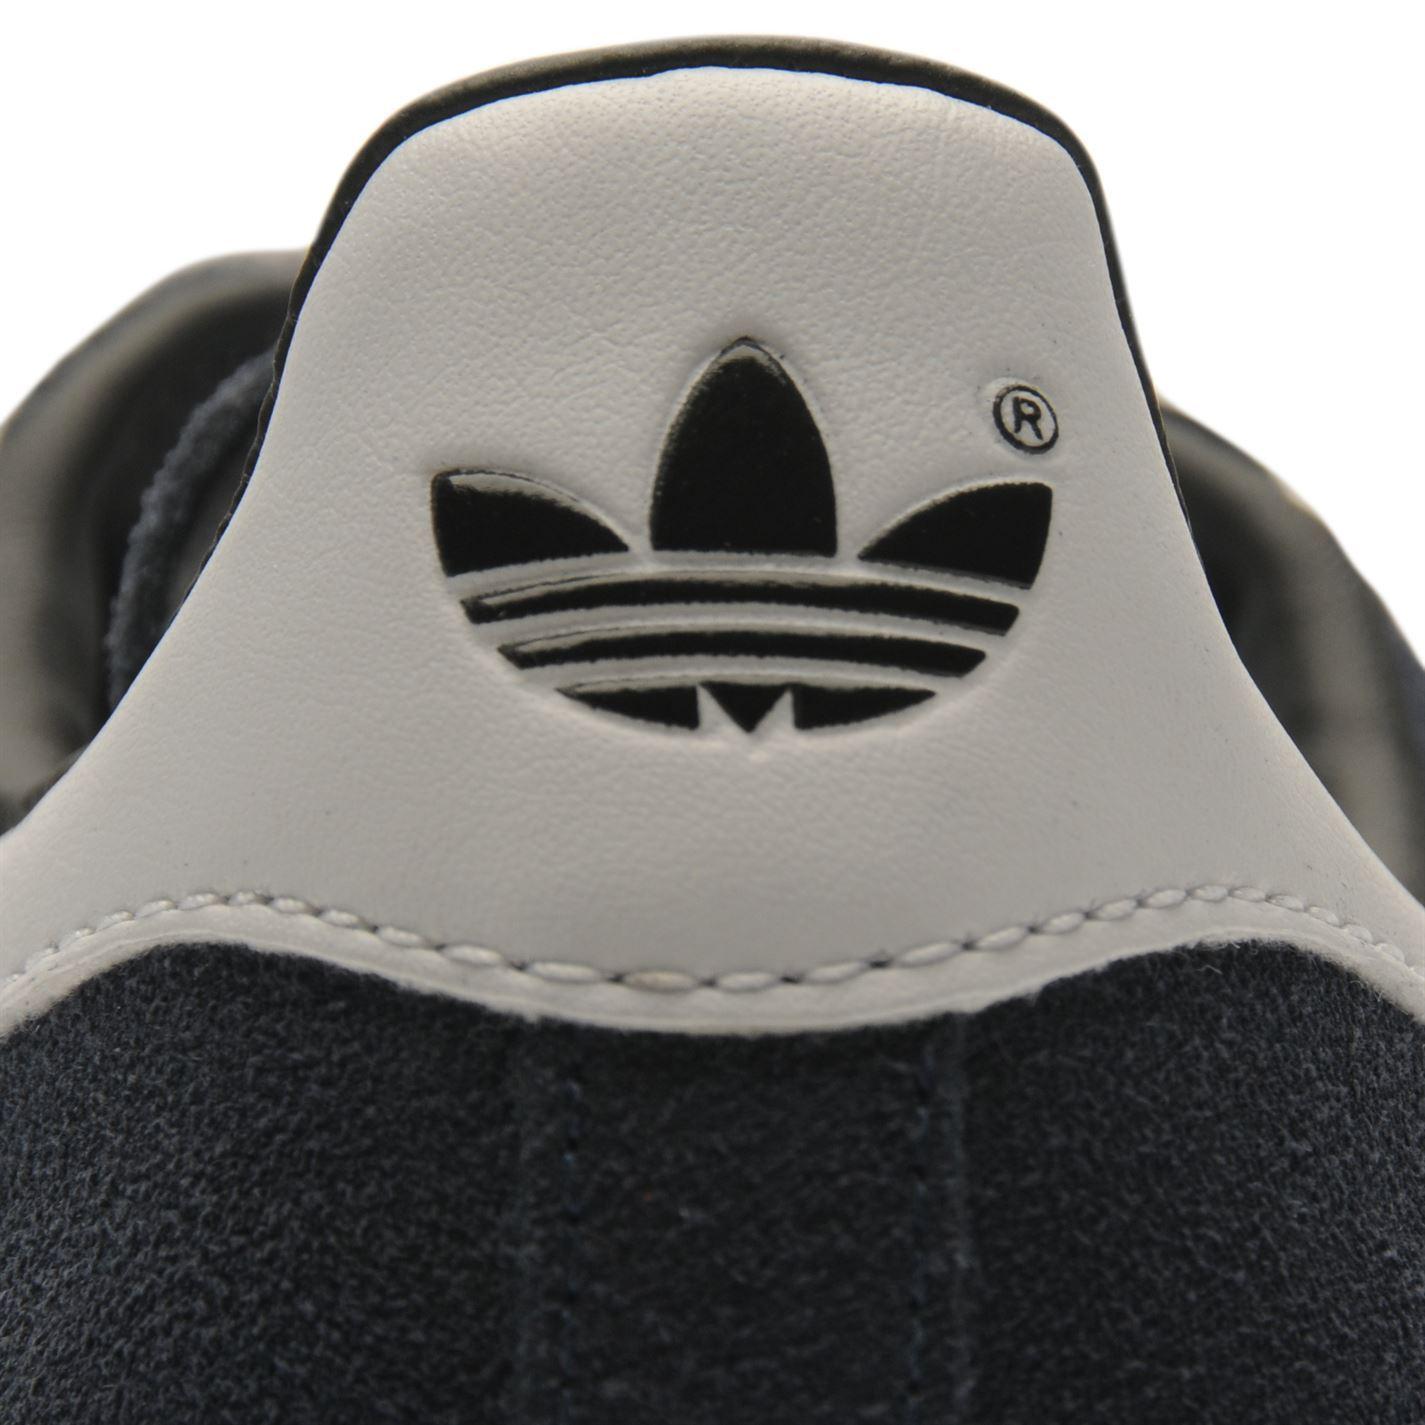 ... Adidas Samba Suede Indoor Football Futsal Trainers Juniors Blue Wht Soccer  Shoes bf84a45fbc4